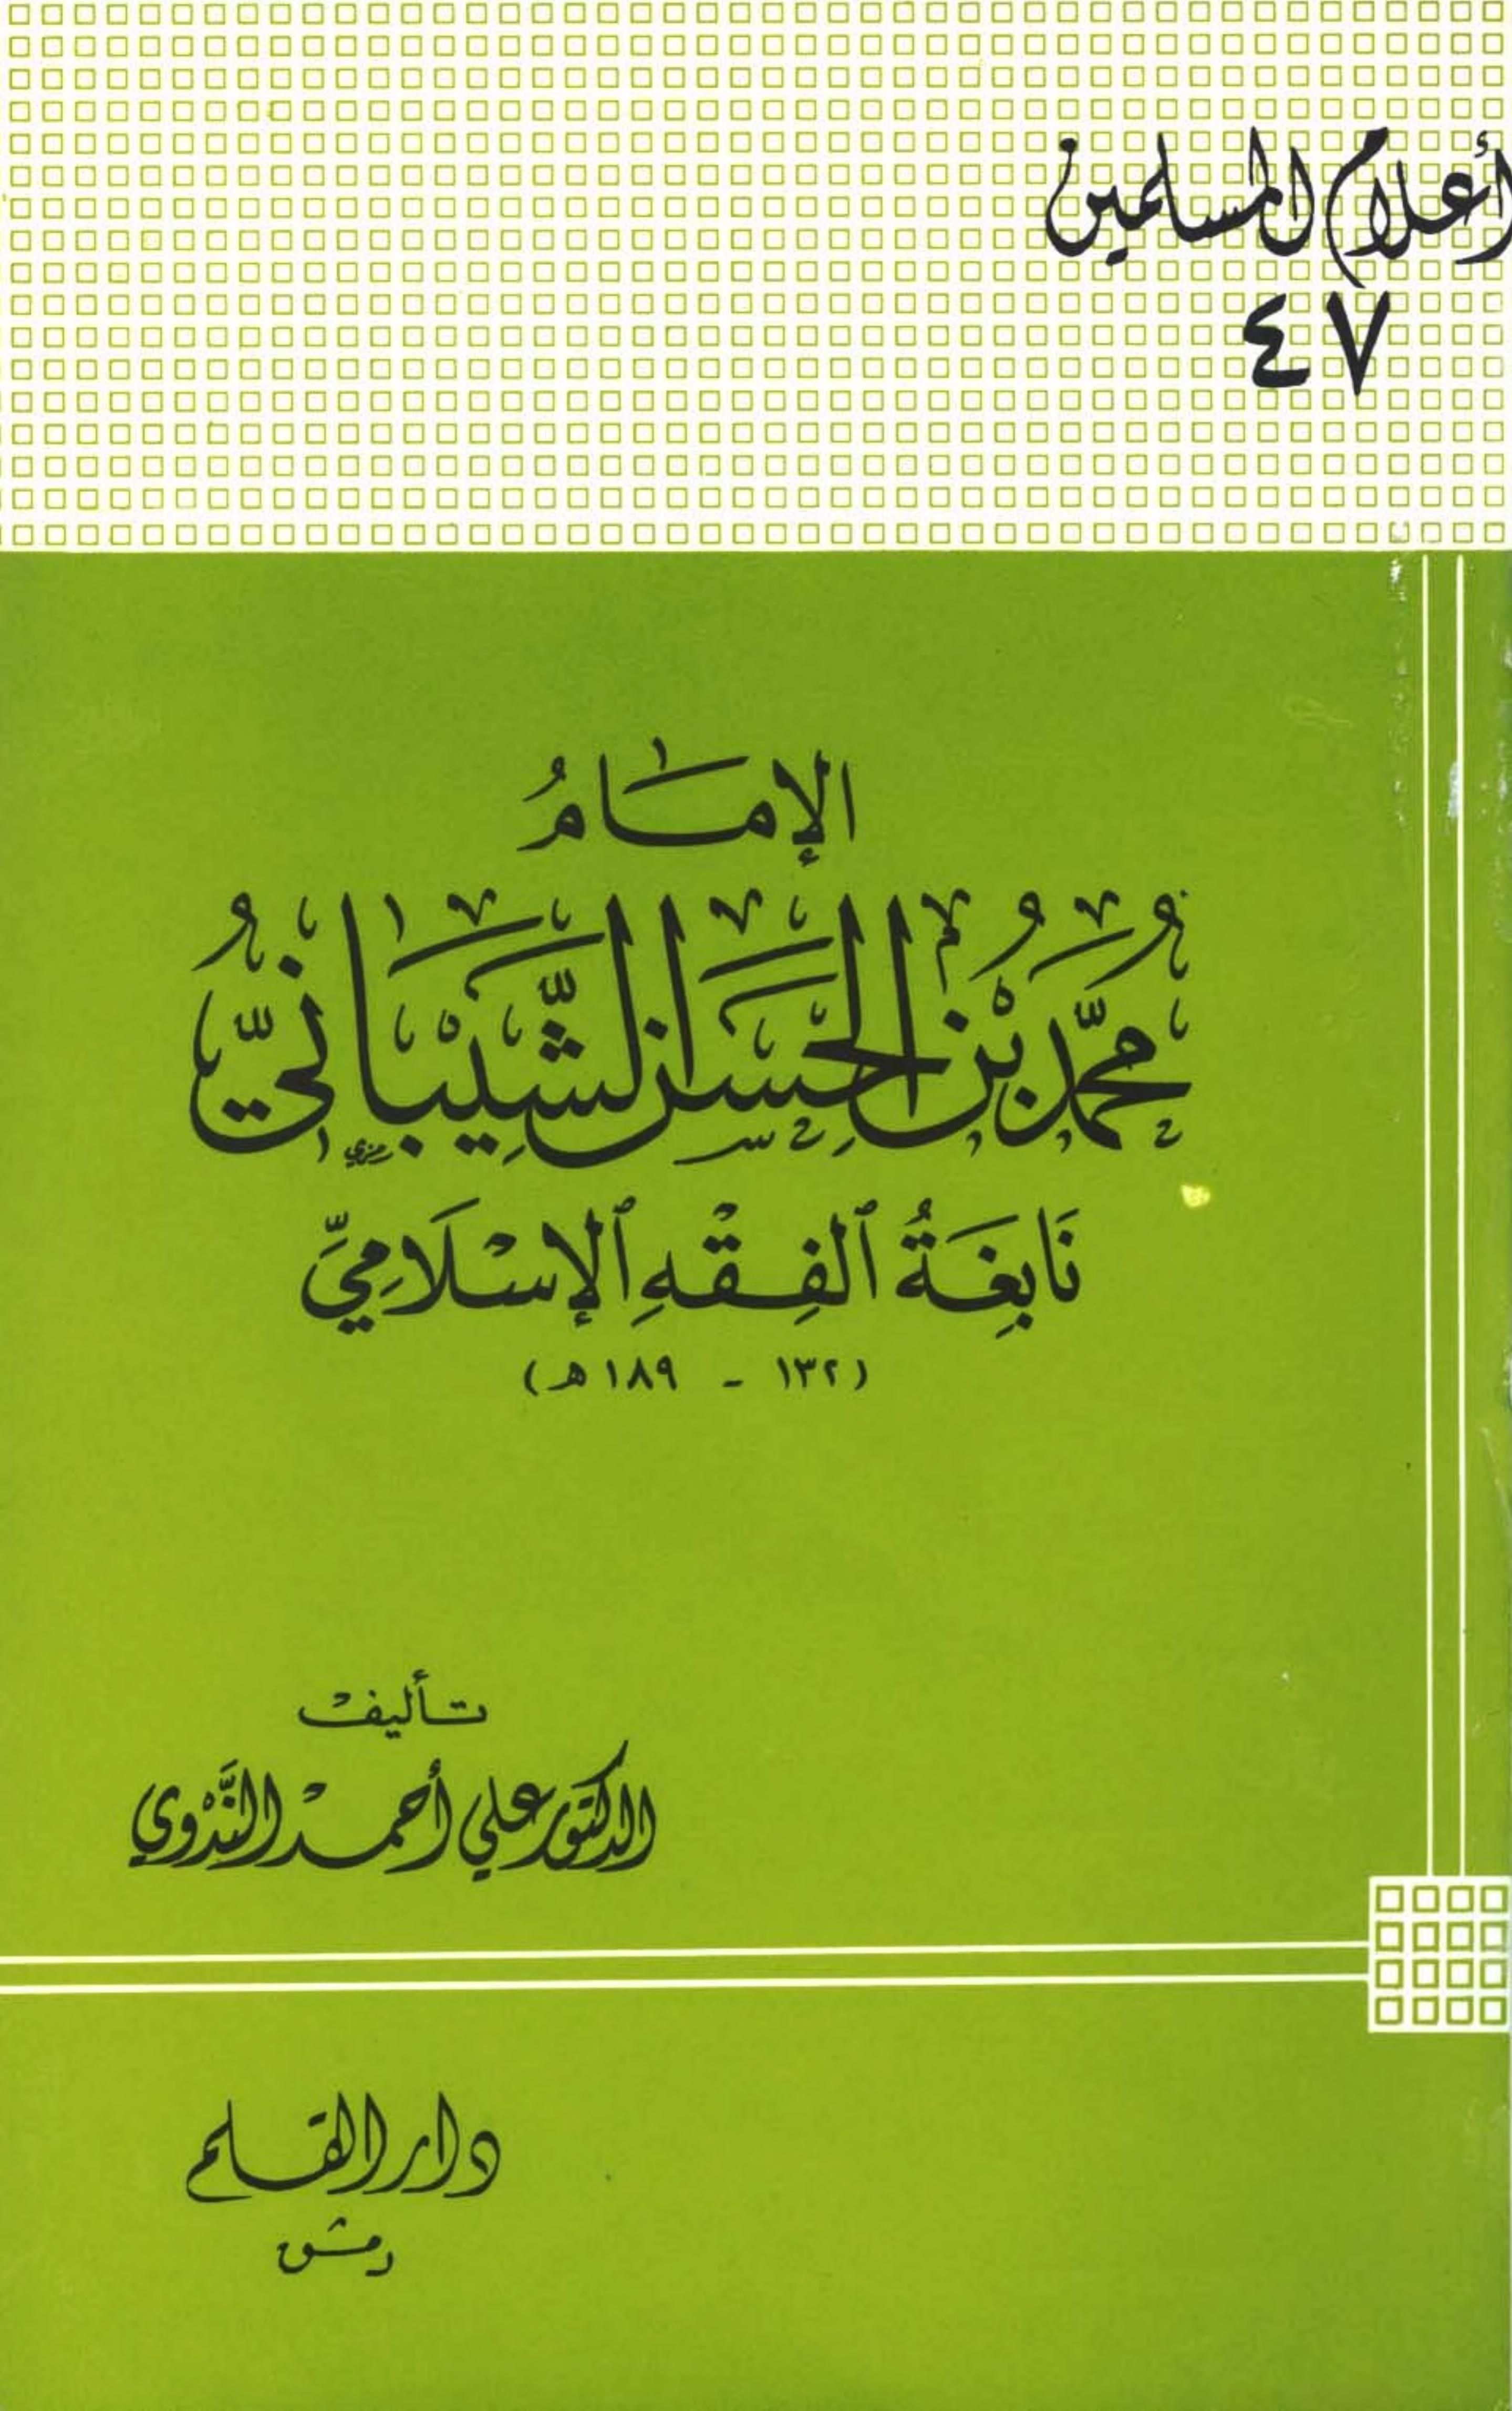 Https Archive Org Stream 99 20200504 47 الإمام محمد بن الحسن الشيباني نابغة الفقه الإسلامي أحمد علي الندوي Internet Archive Pdf